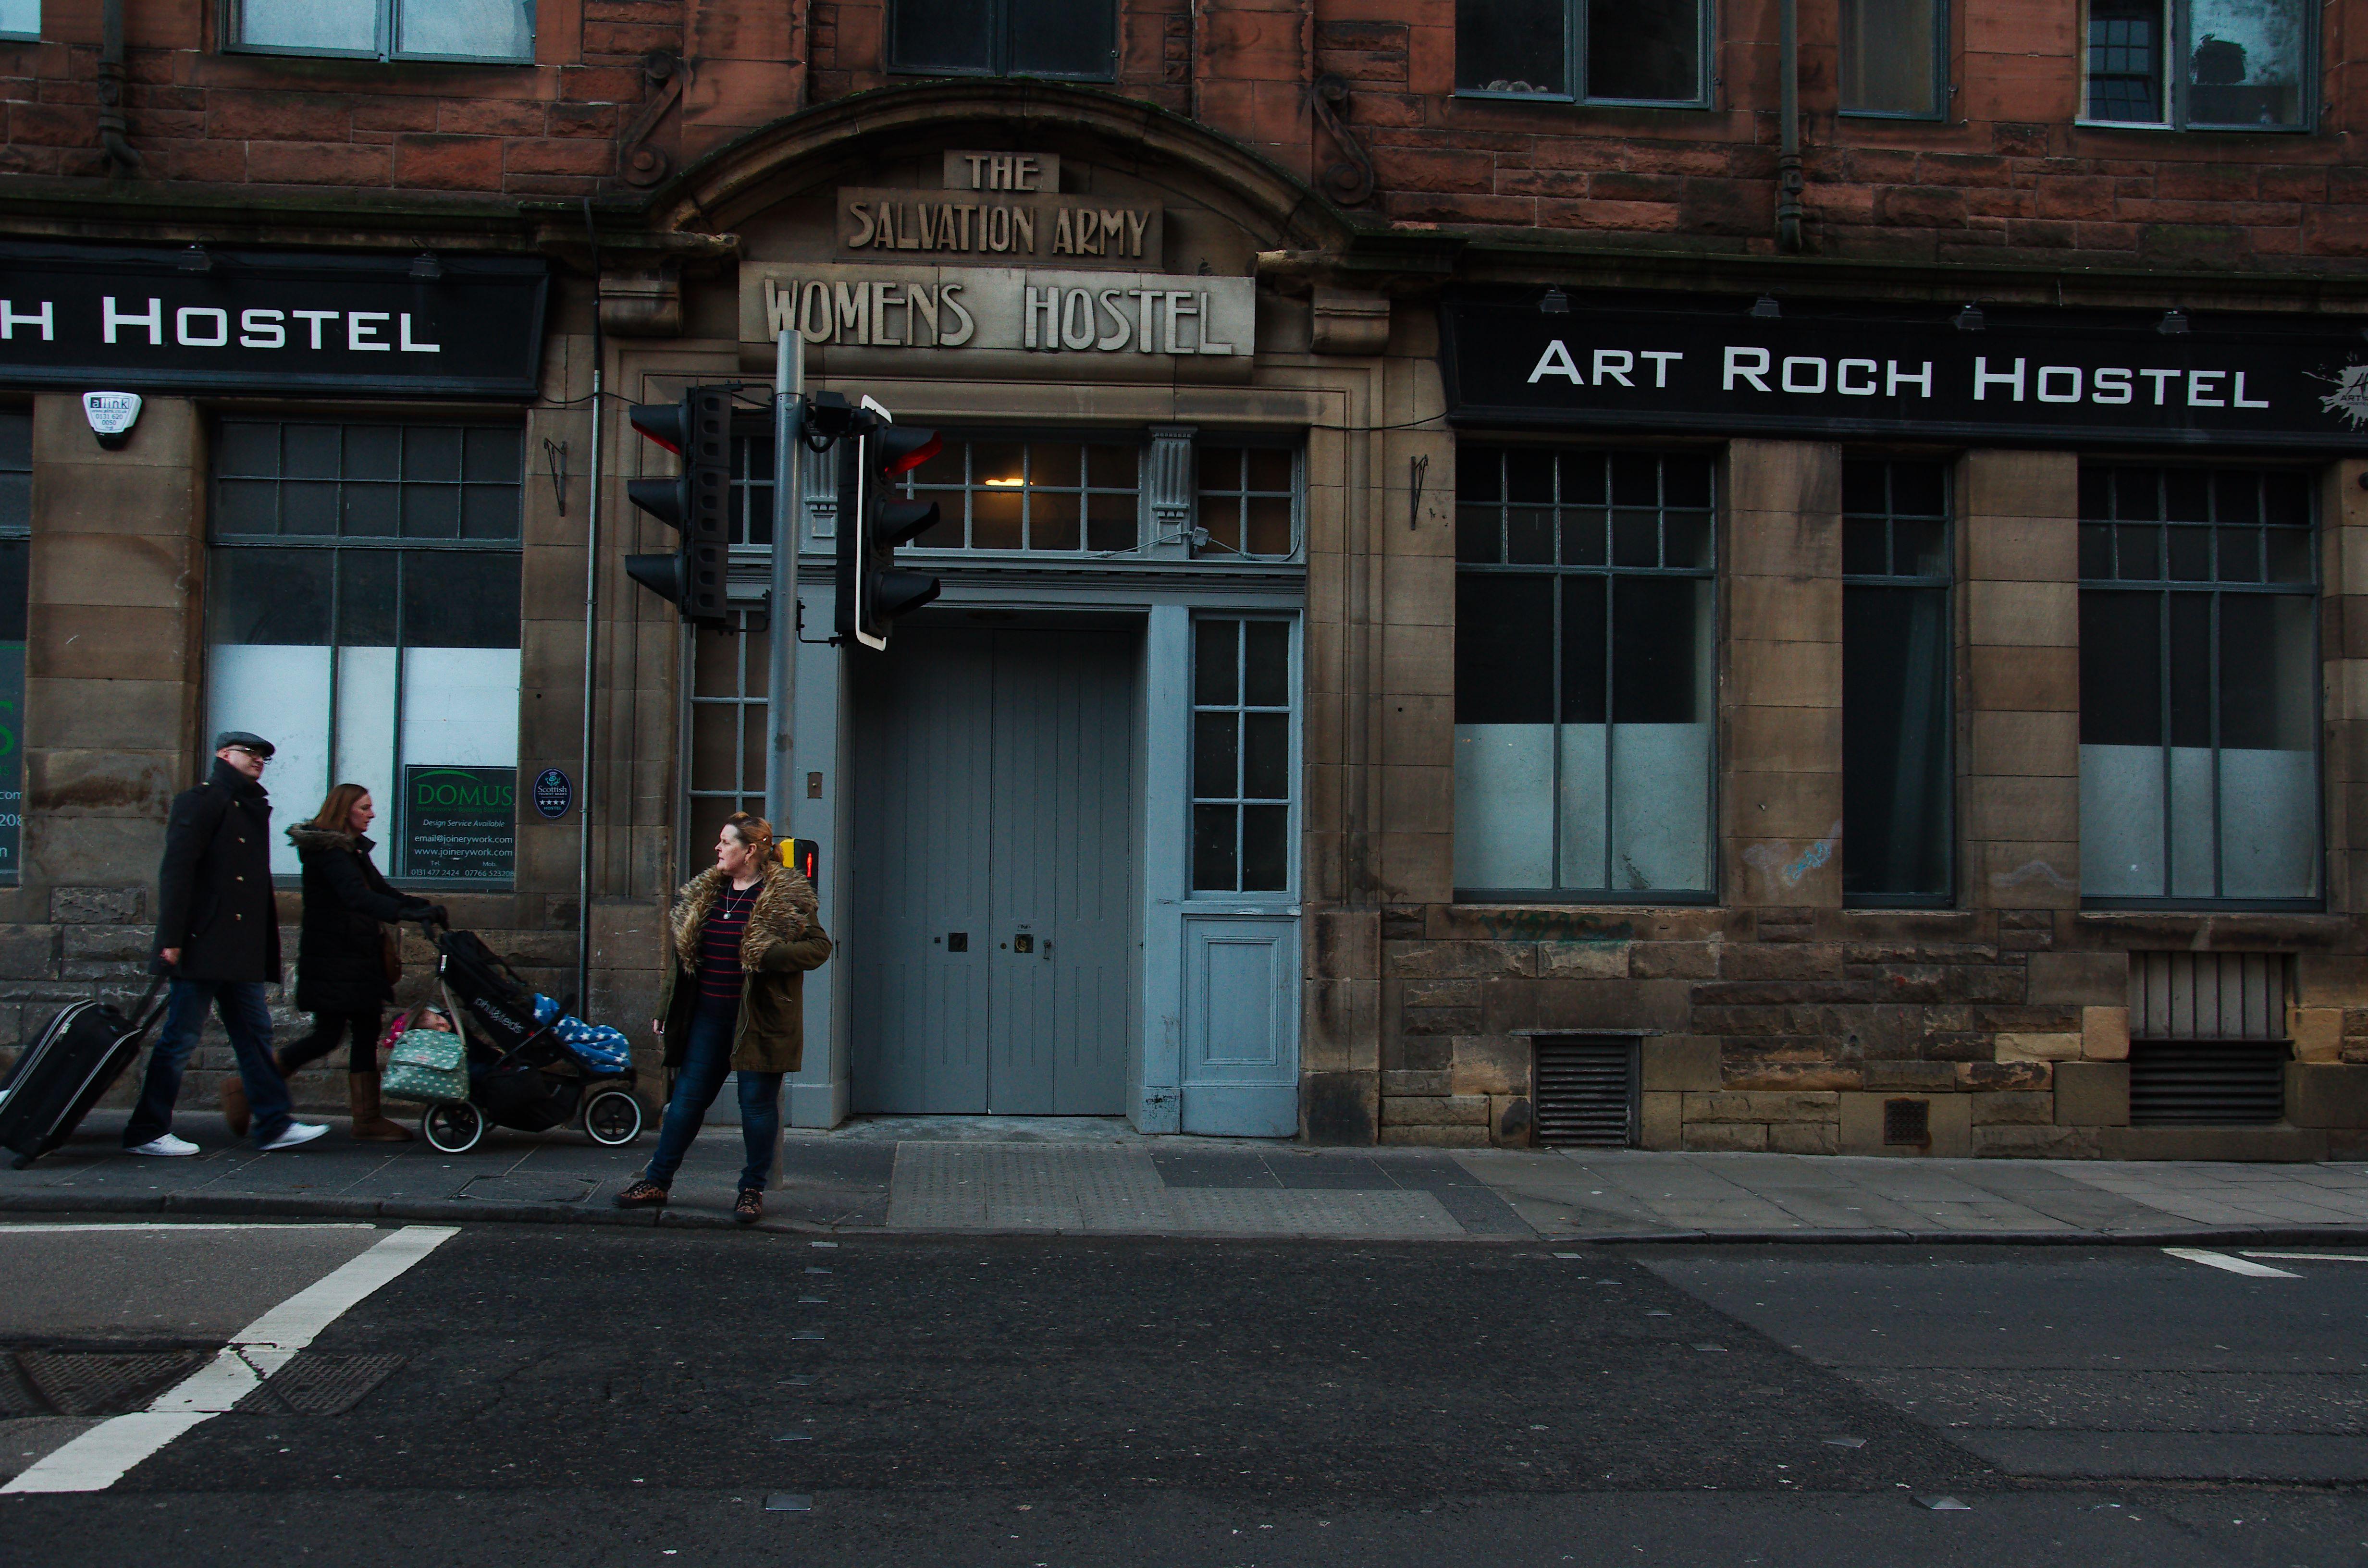 Dónde dormir en Edimburgo